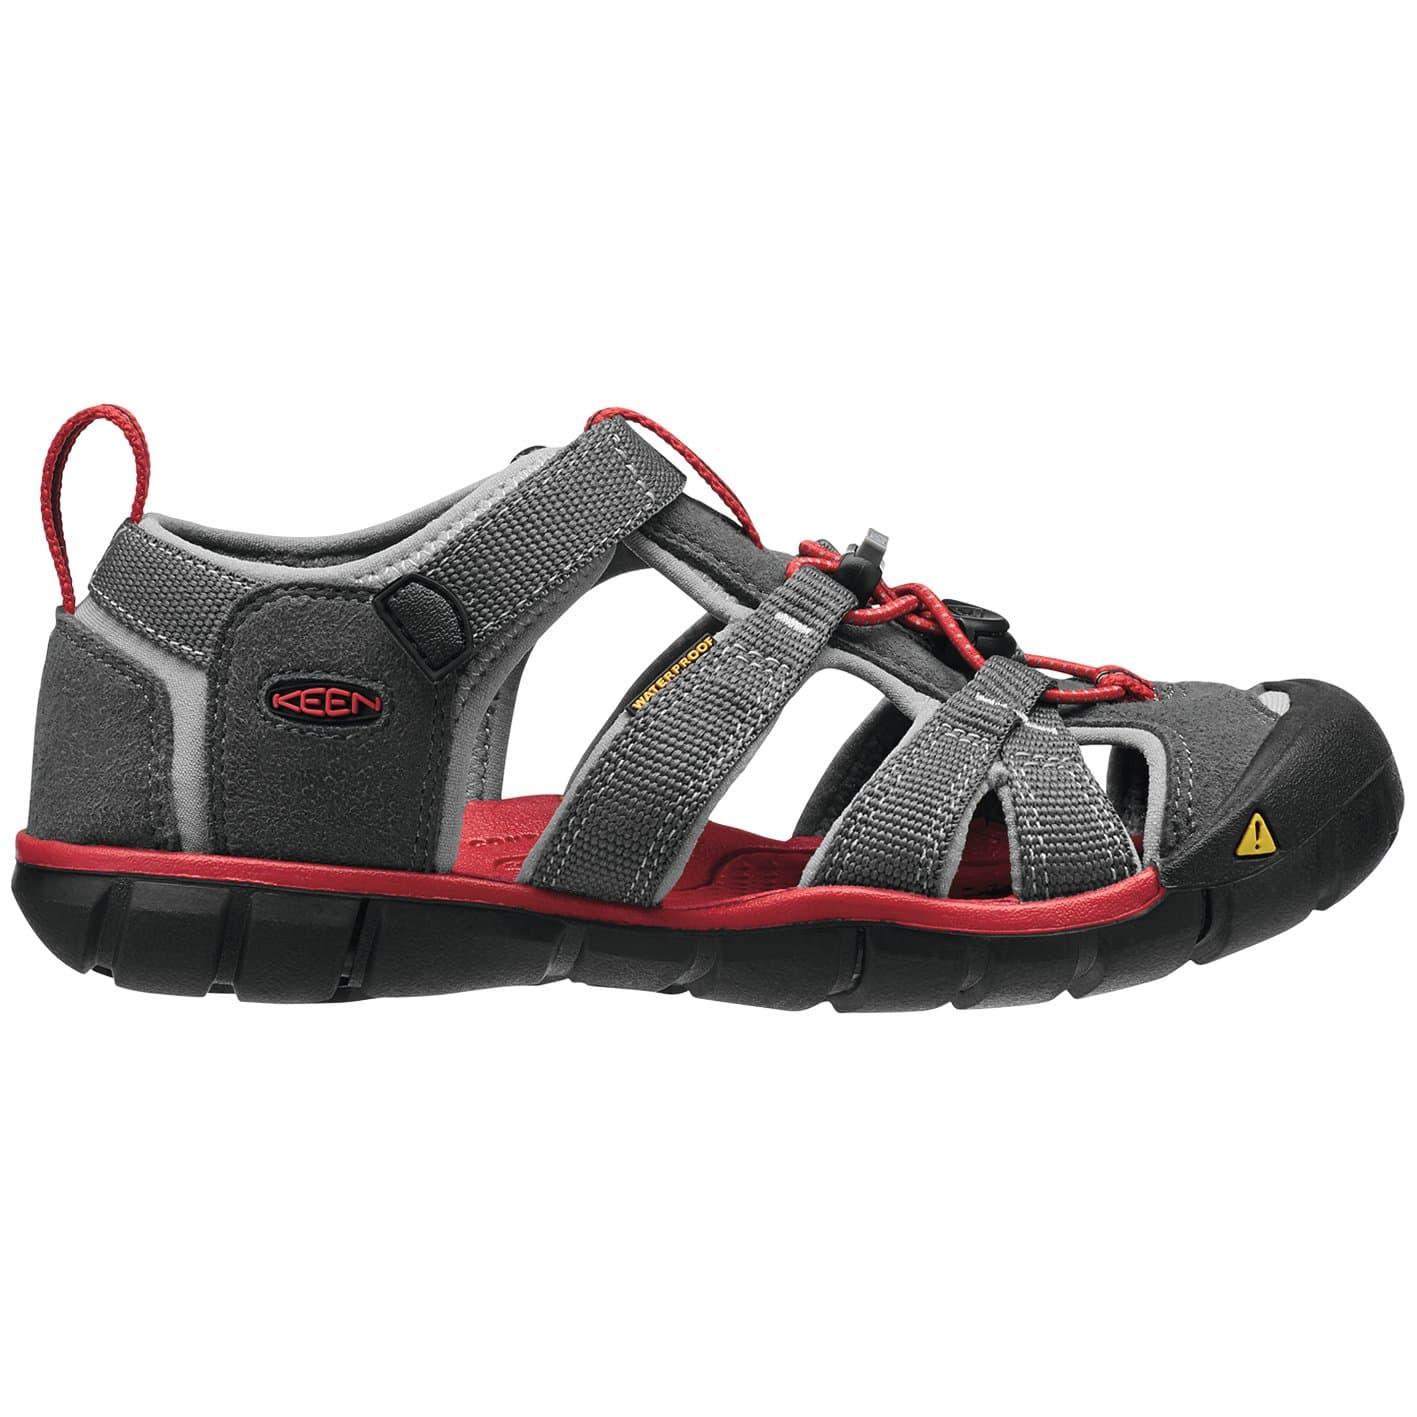 Keen Seacamp II CNX Kinder-Sandale